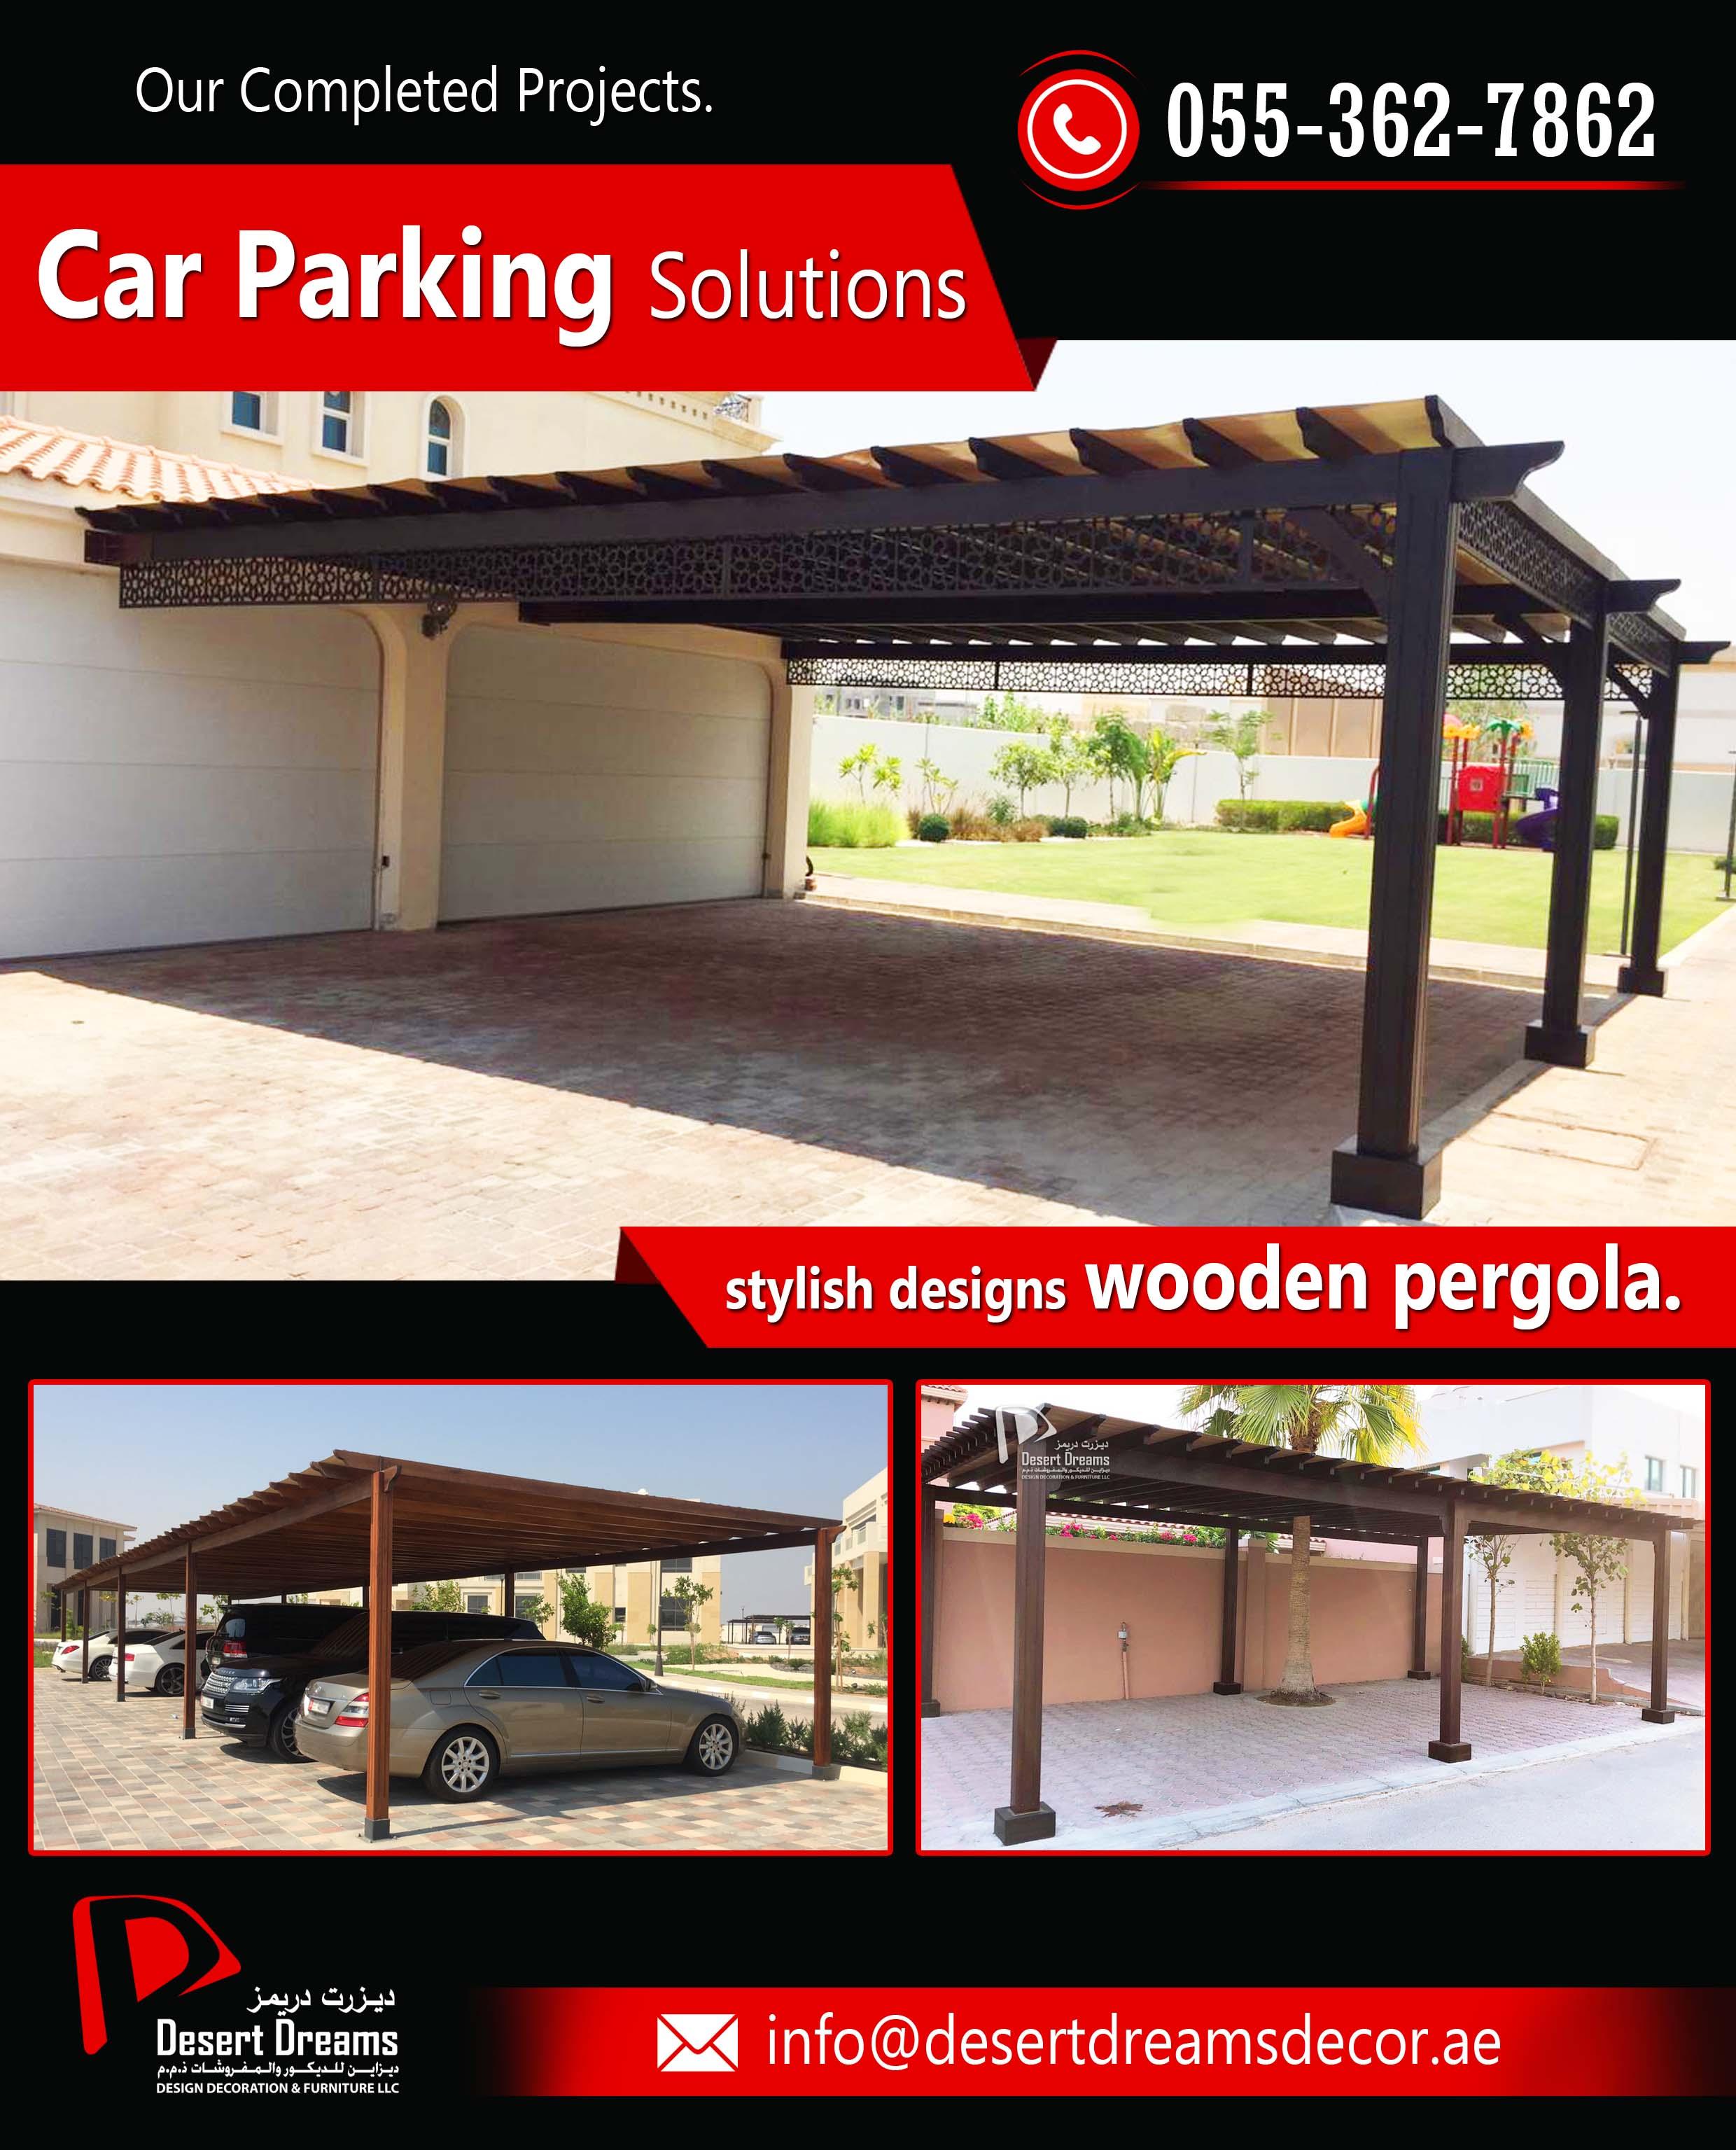 Car Parking Wooden Pergola UAE_Pergola Images_Desert Dreams (2).jpg